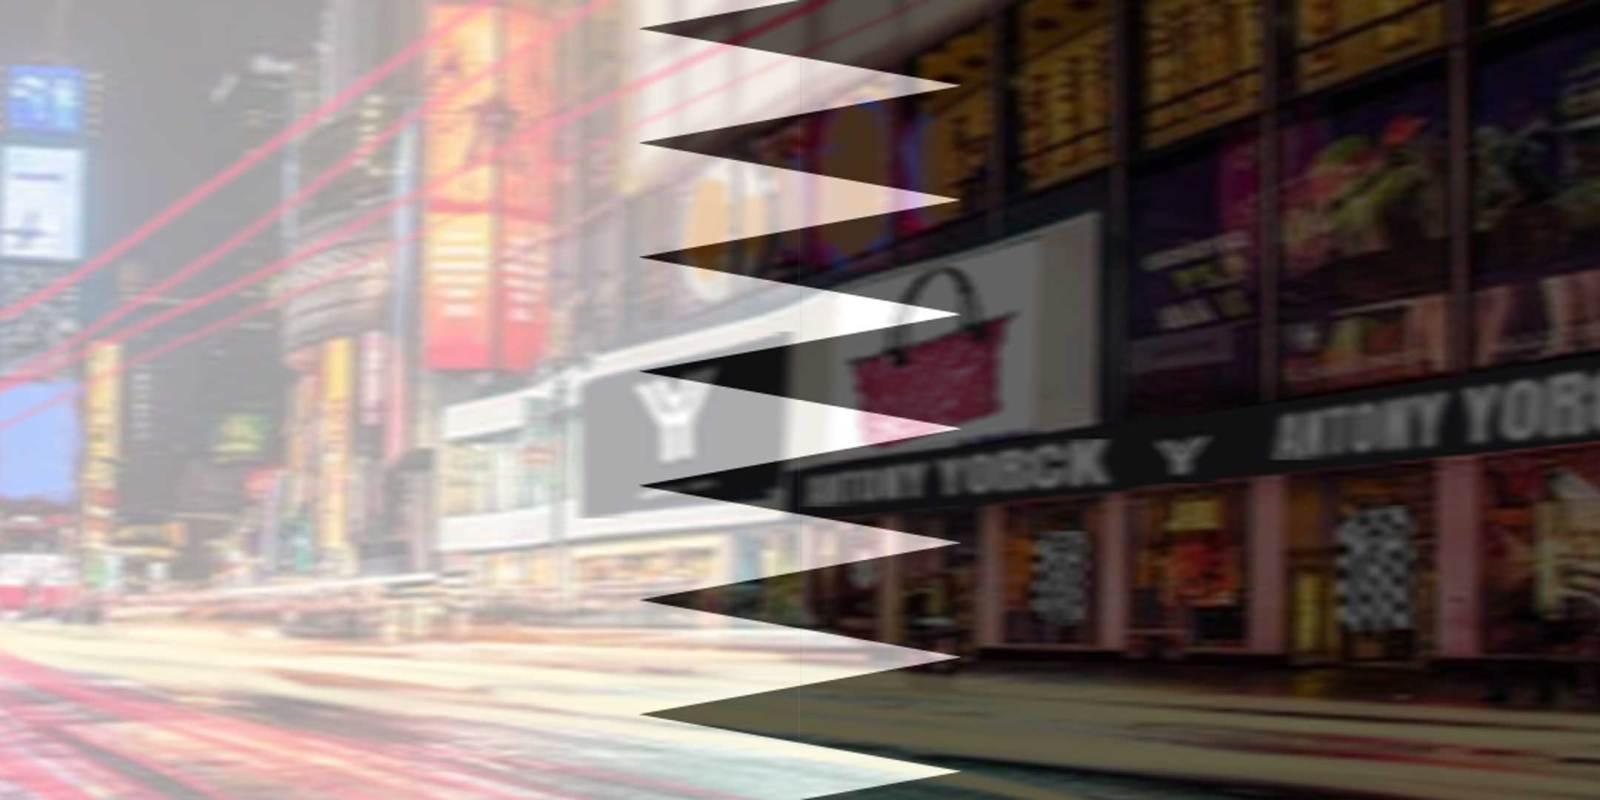 ROUGH DESIGN URBAN STREET STYLE FASHION ONLINE SHOP 1 antony yorck fashion shop hintergrundbild 005